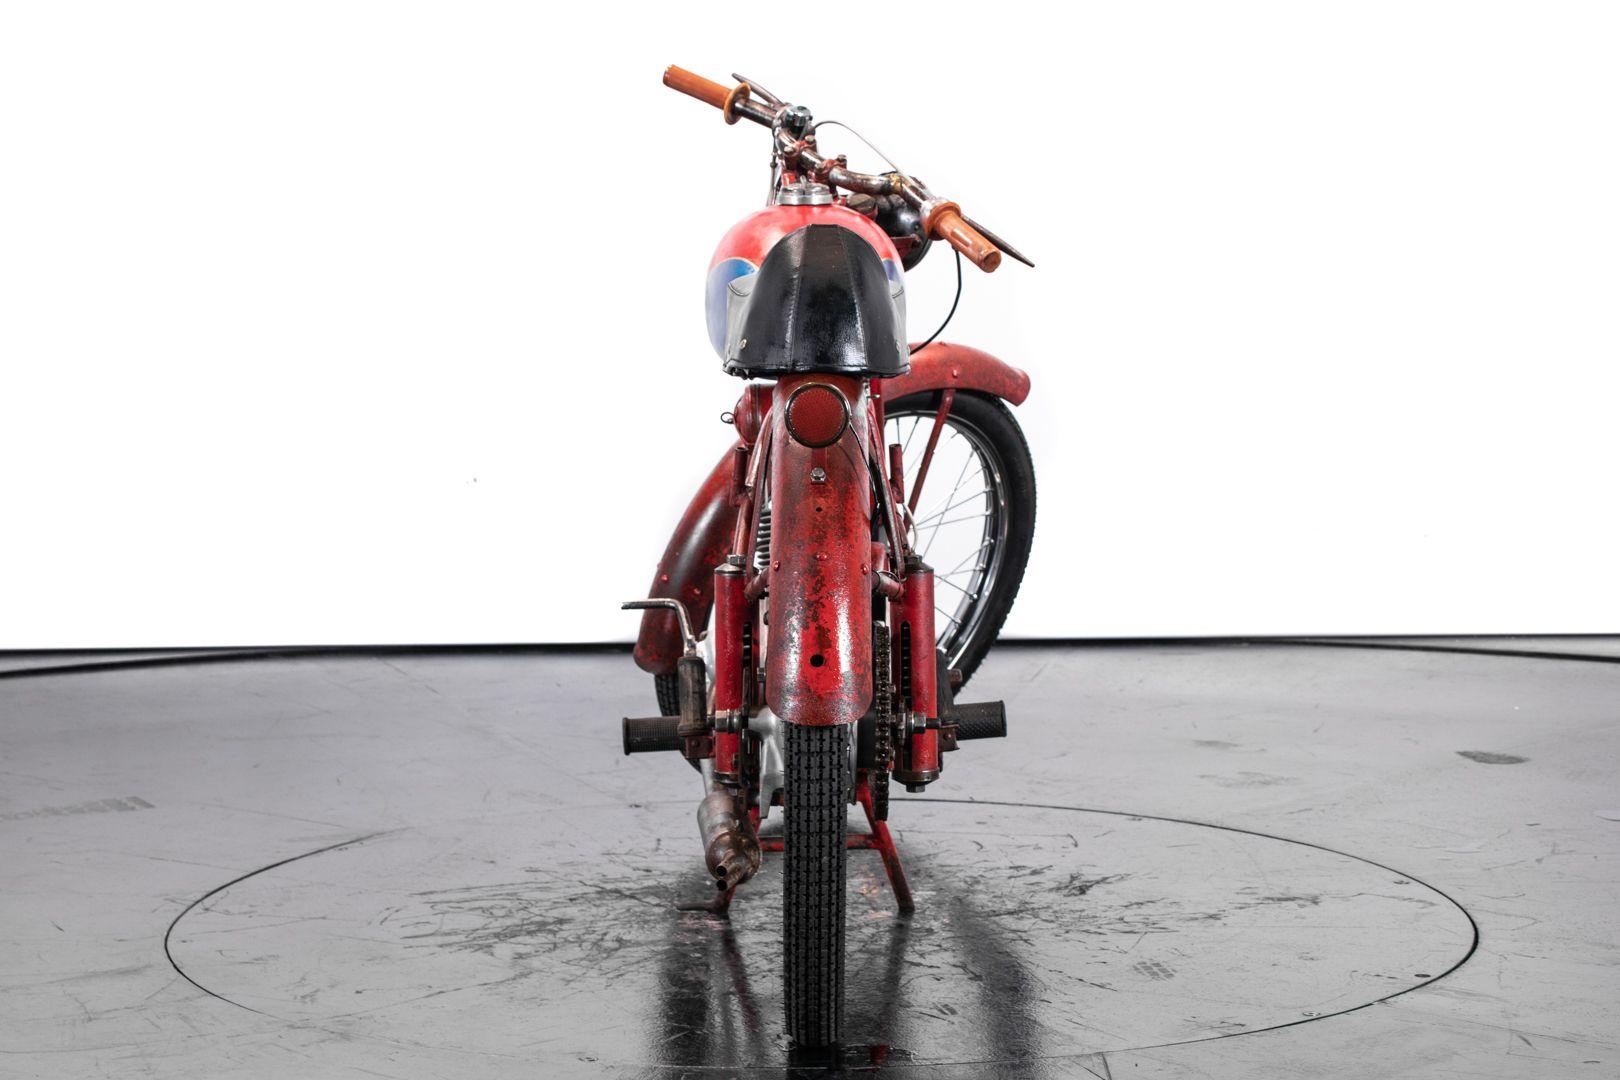 1954 Pirotta 75cc 85024